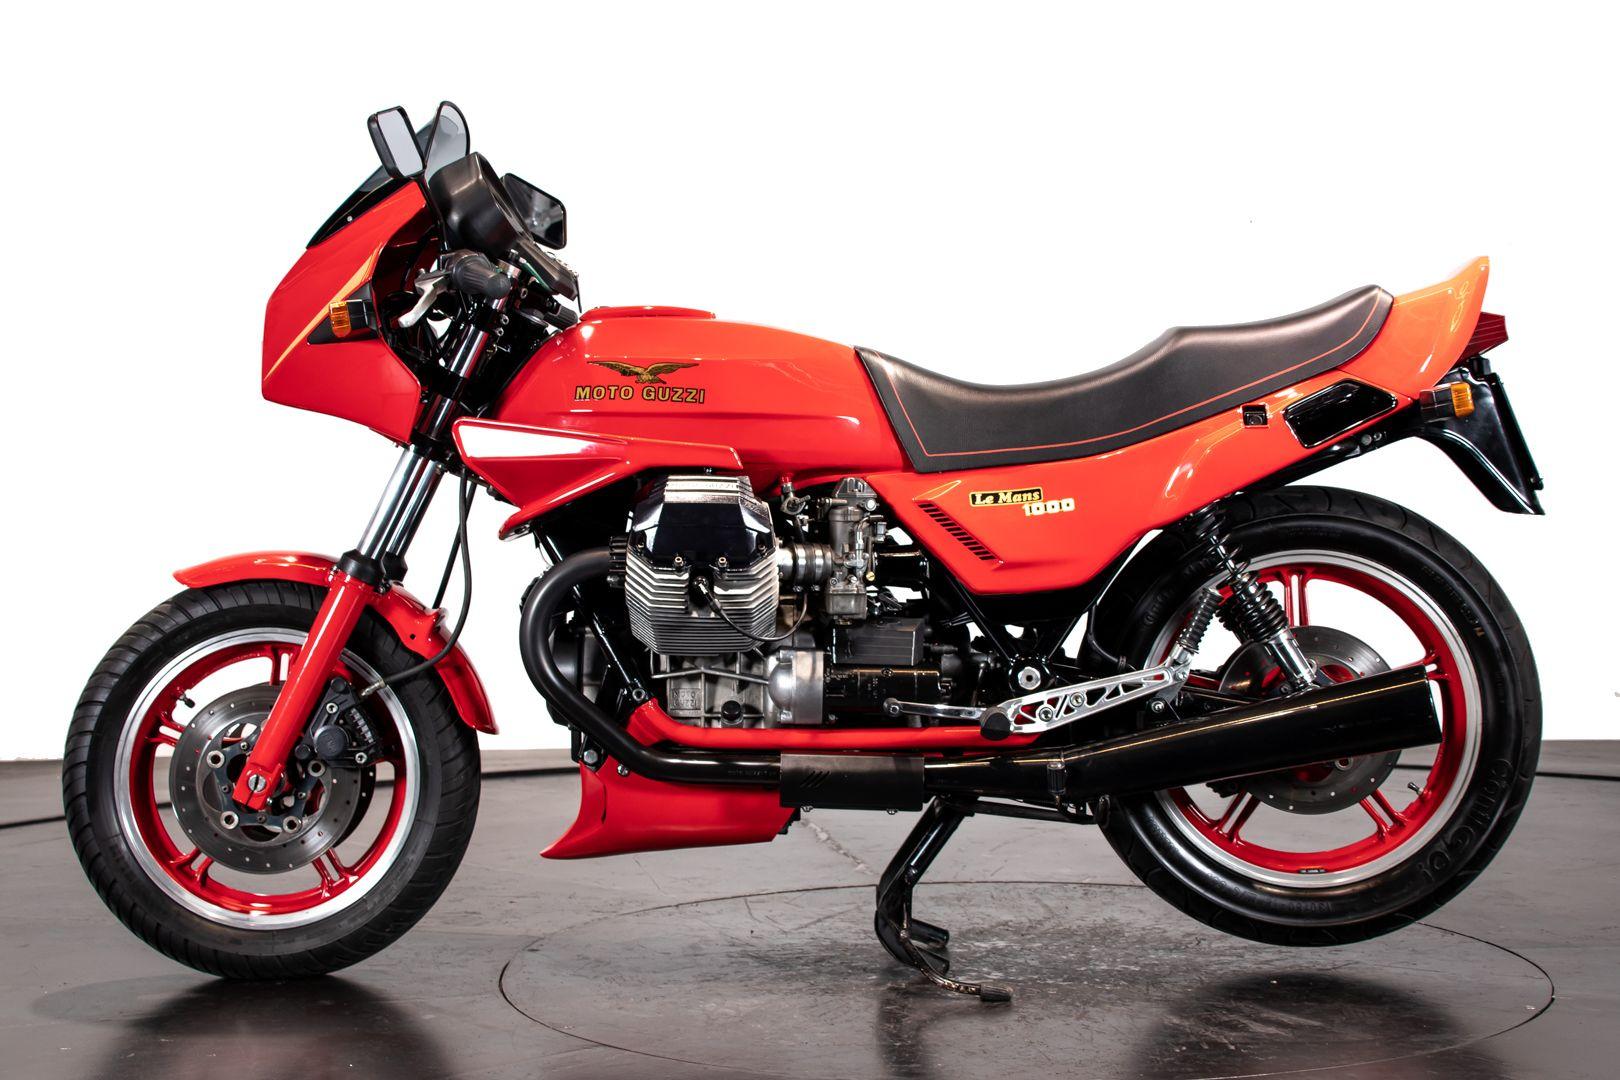 1985 Moto Guzzi le mans 1000 57517